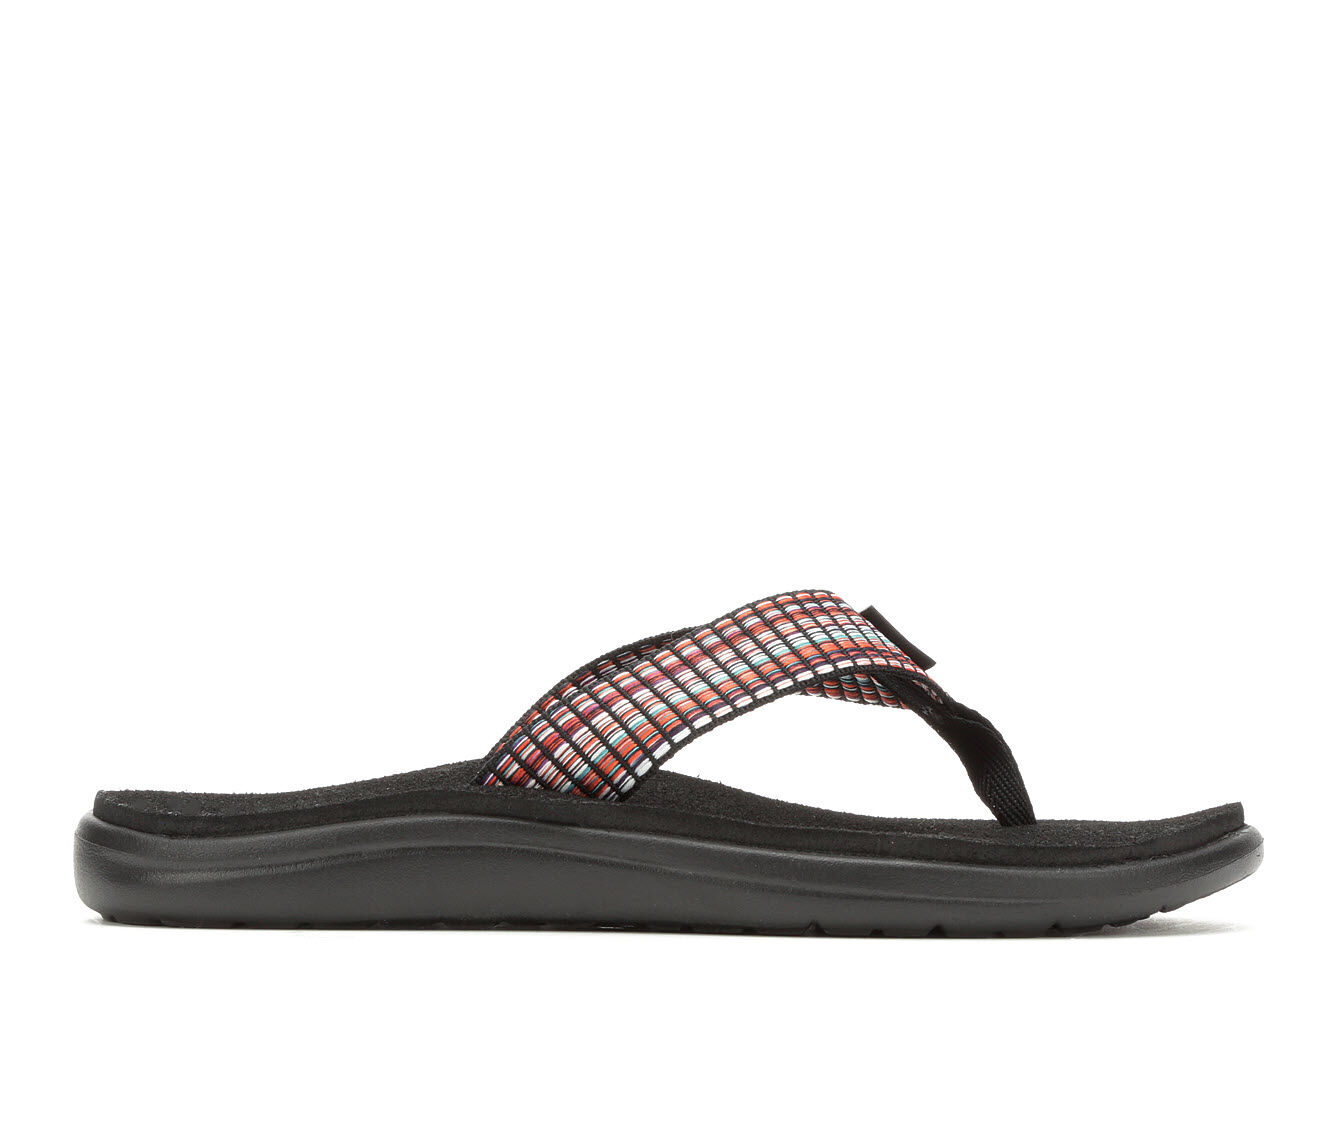 Women's Teva Voya Flip W Sandals Black Multi